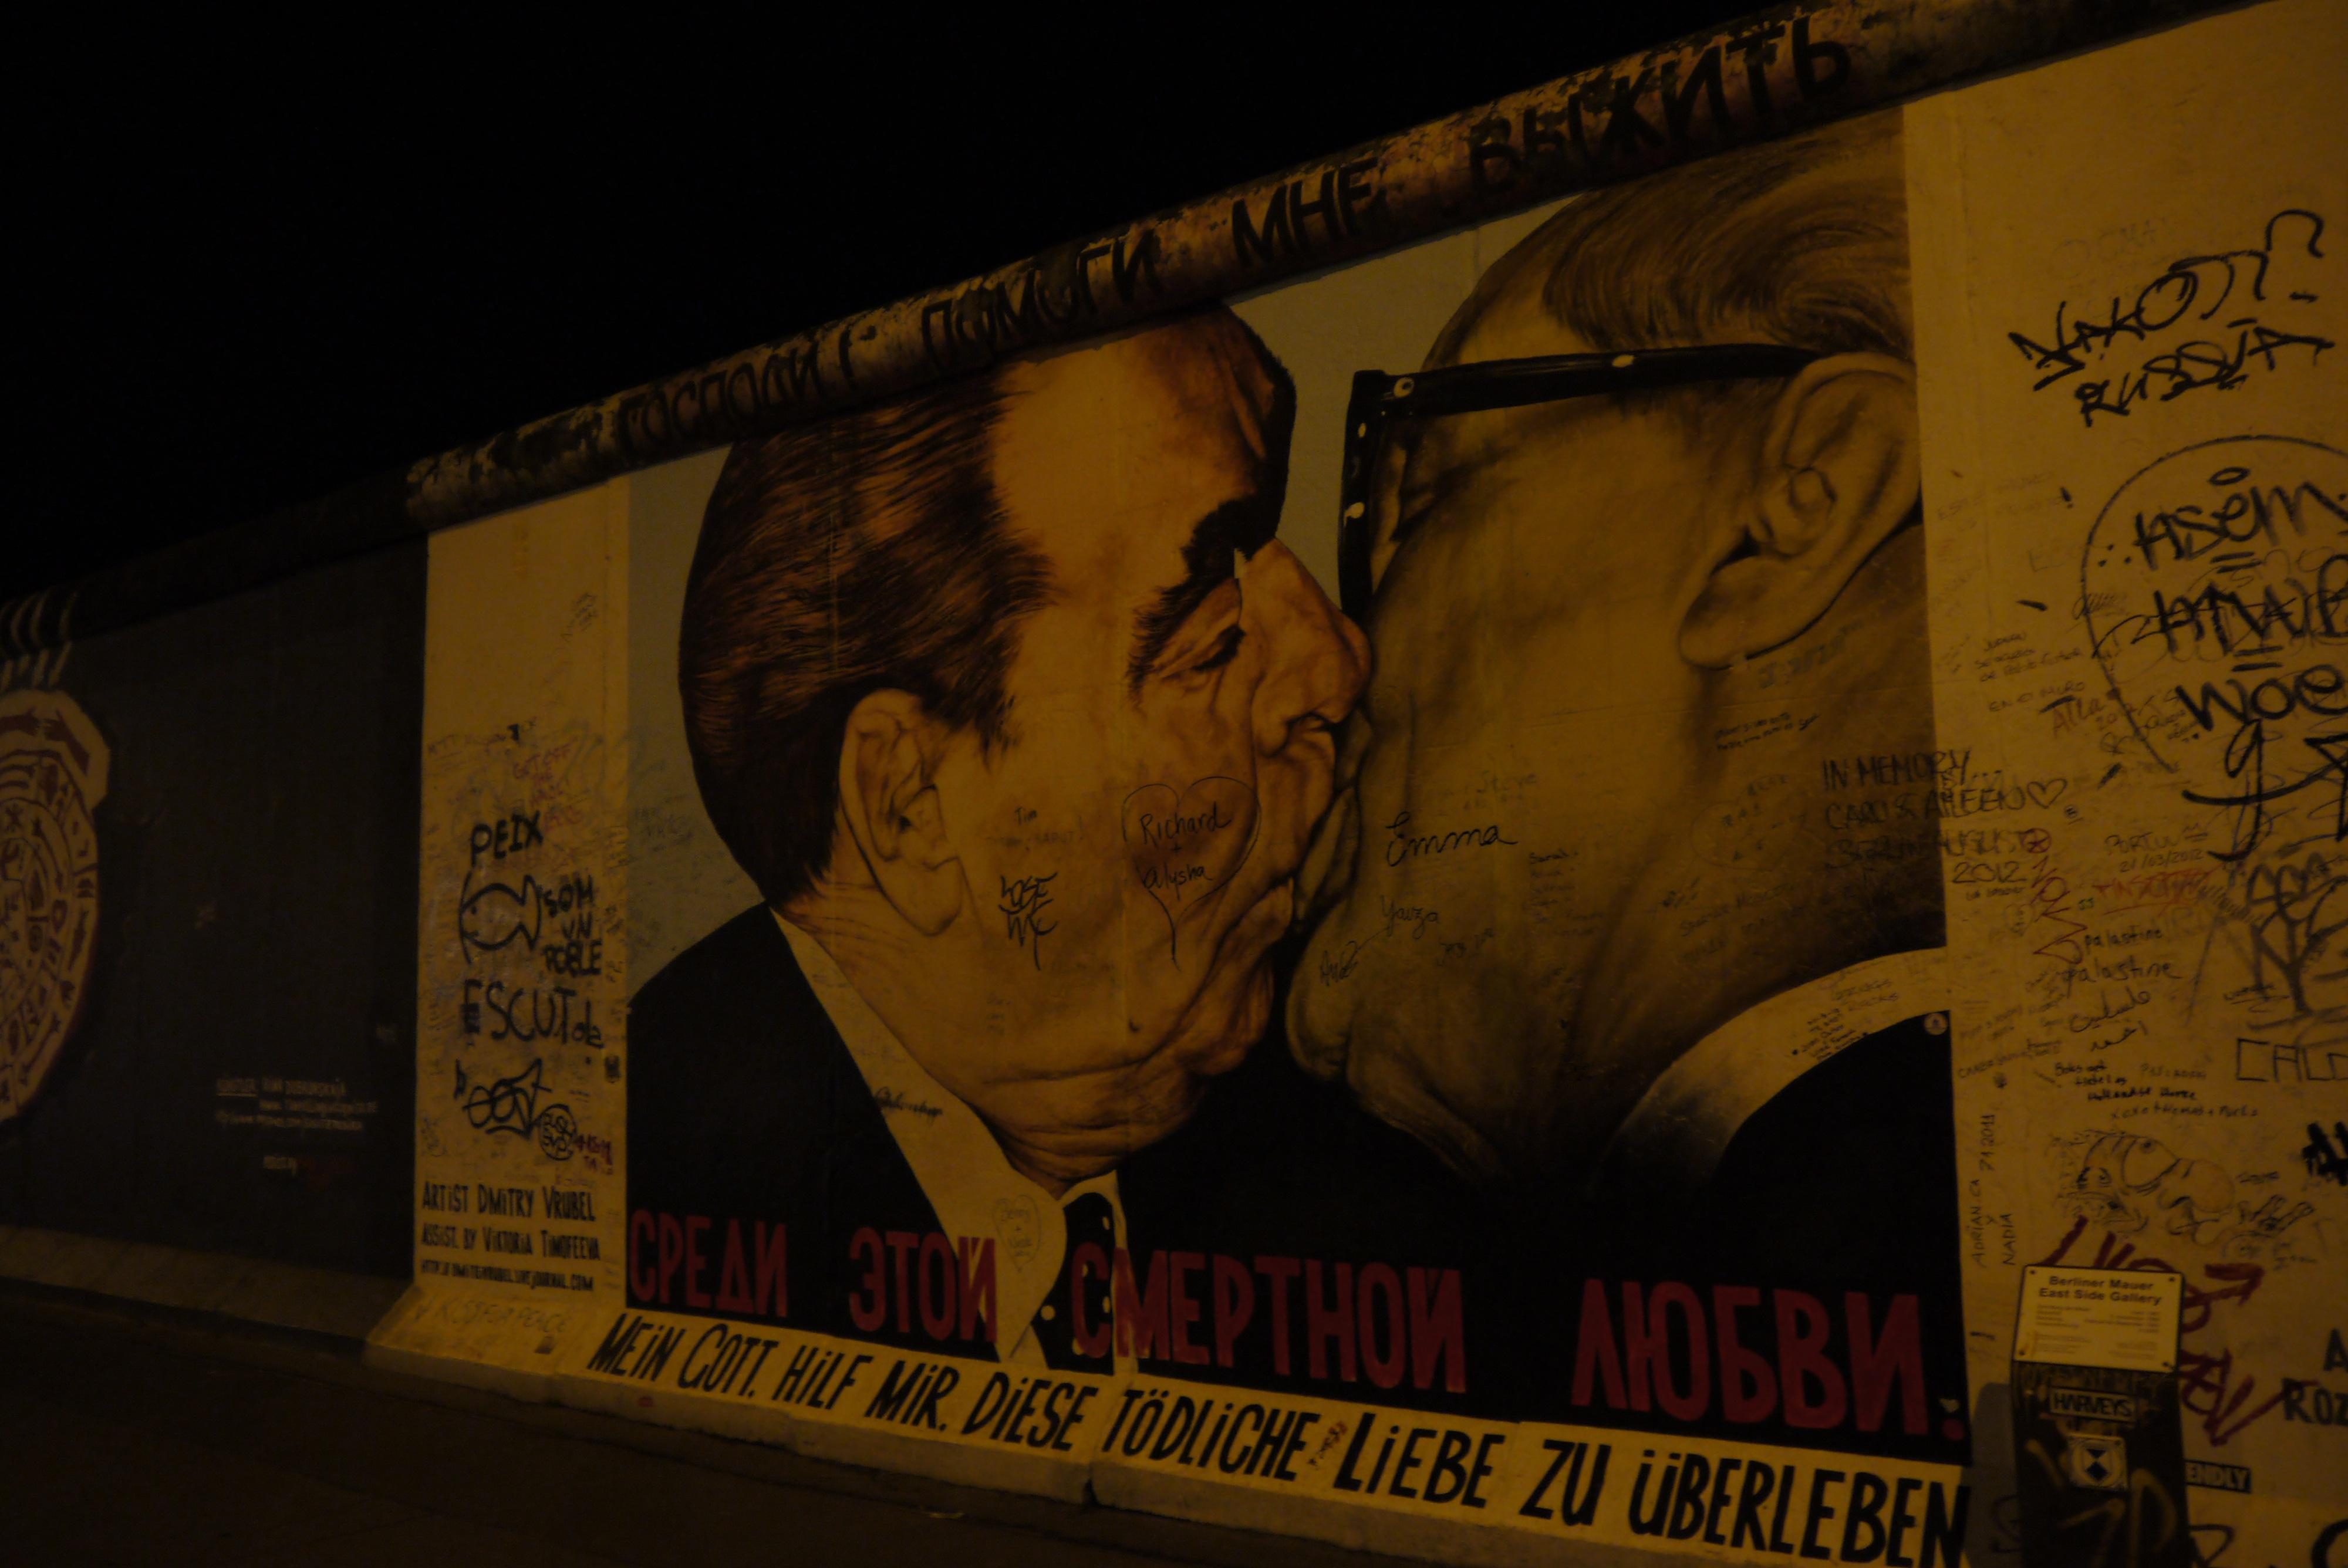 M Ia Malam Dinding Iklan Artistik Ciuman Coretan Seni Jalanan Seni Berlin Poster Sejarah Tembok Berlin